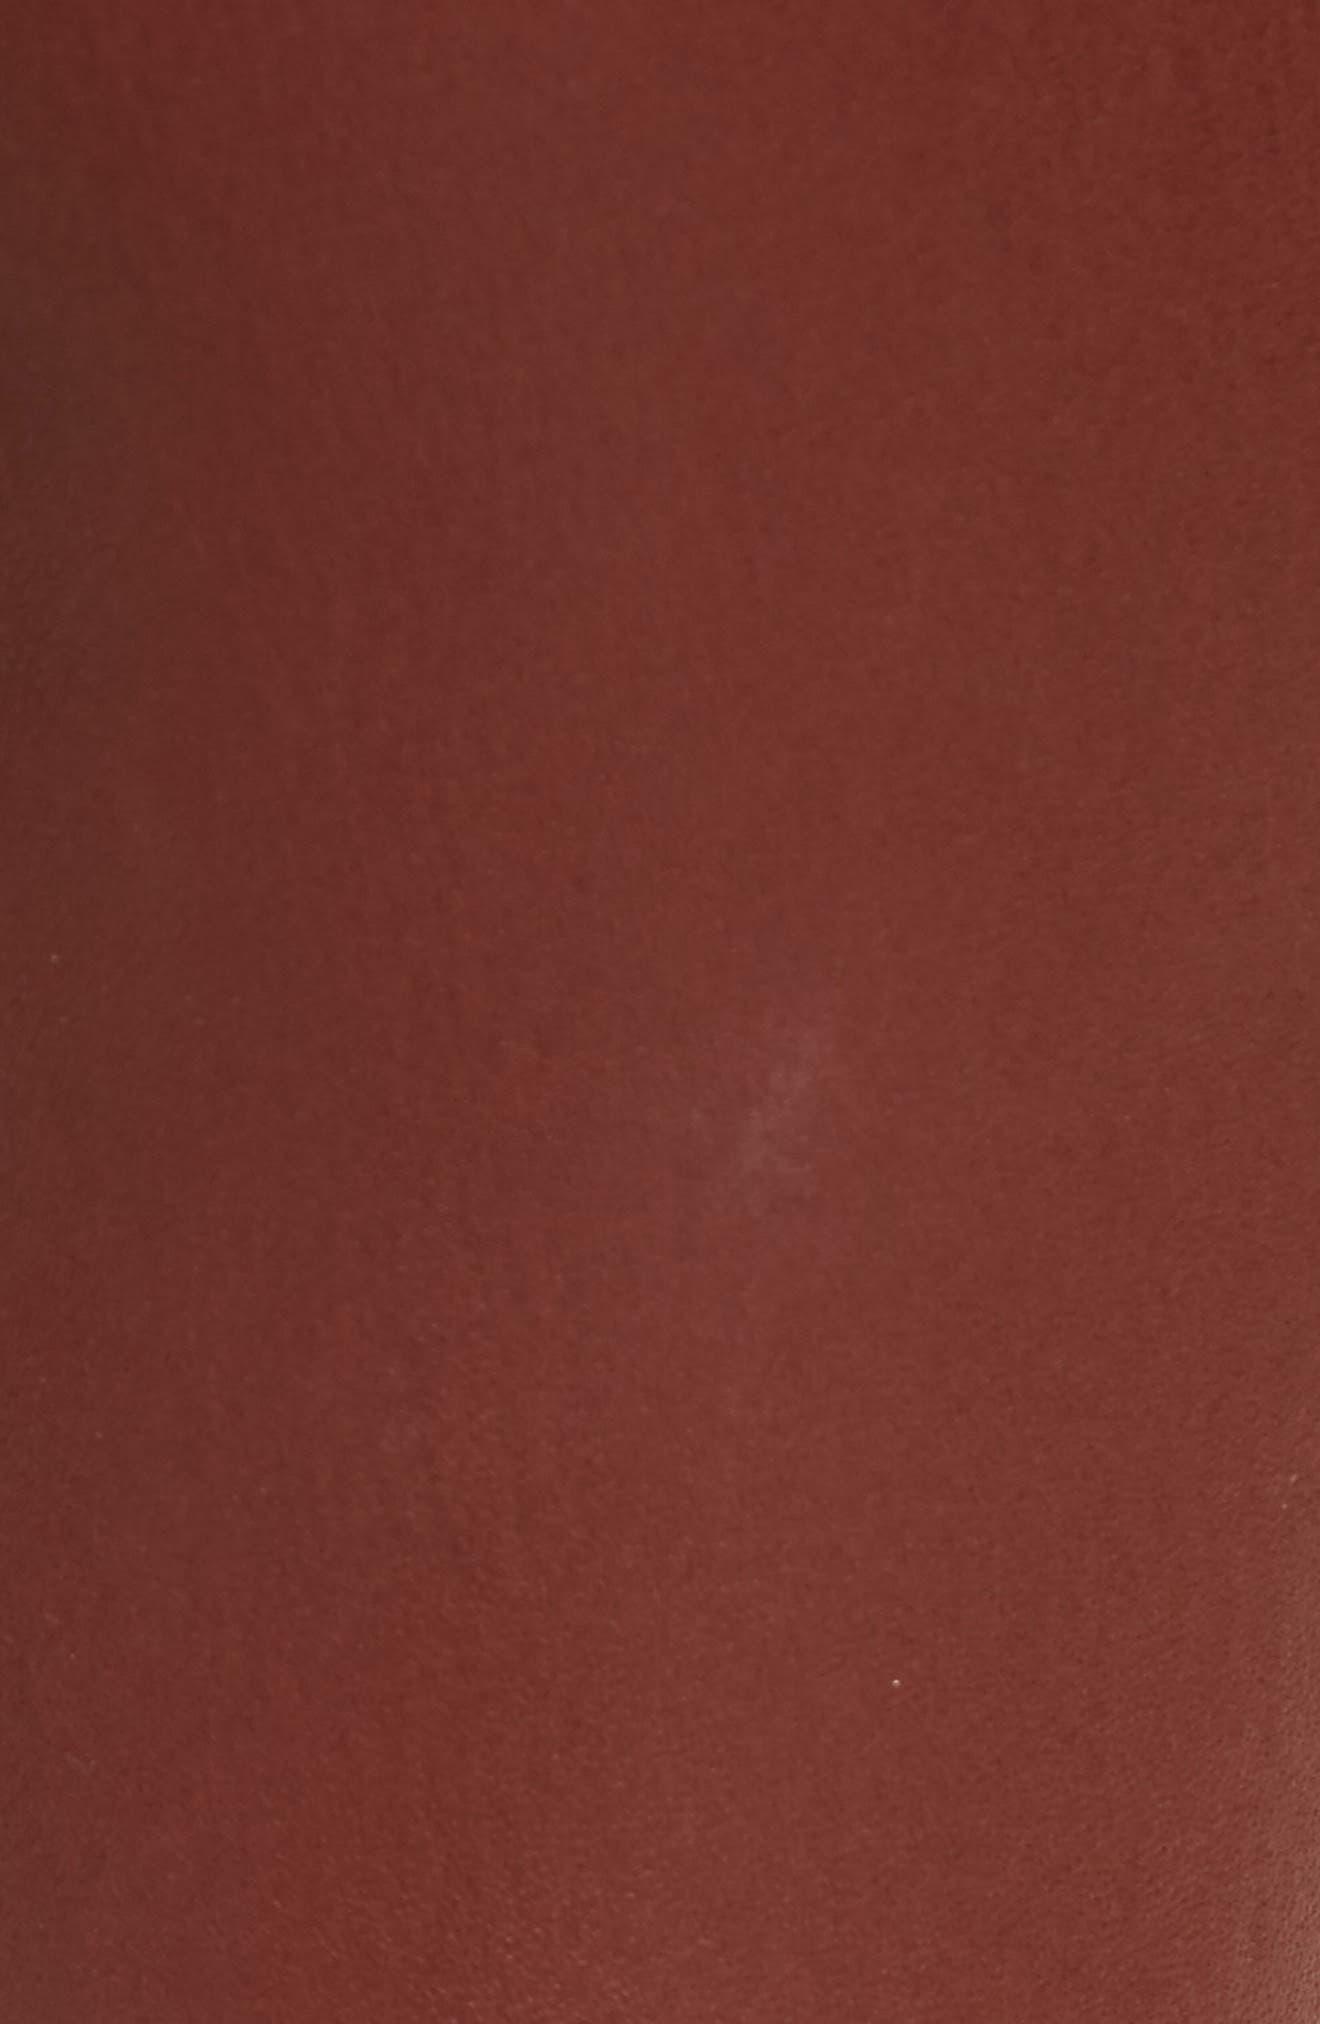 Bristol Leather Riding Pants,                             Alternate thumbnail 5, color,                             215